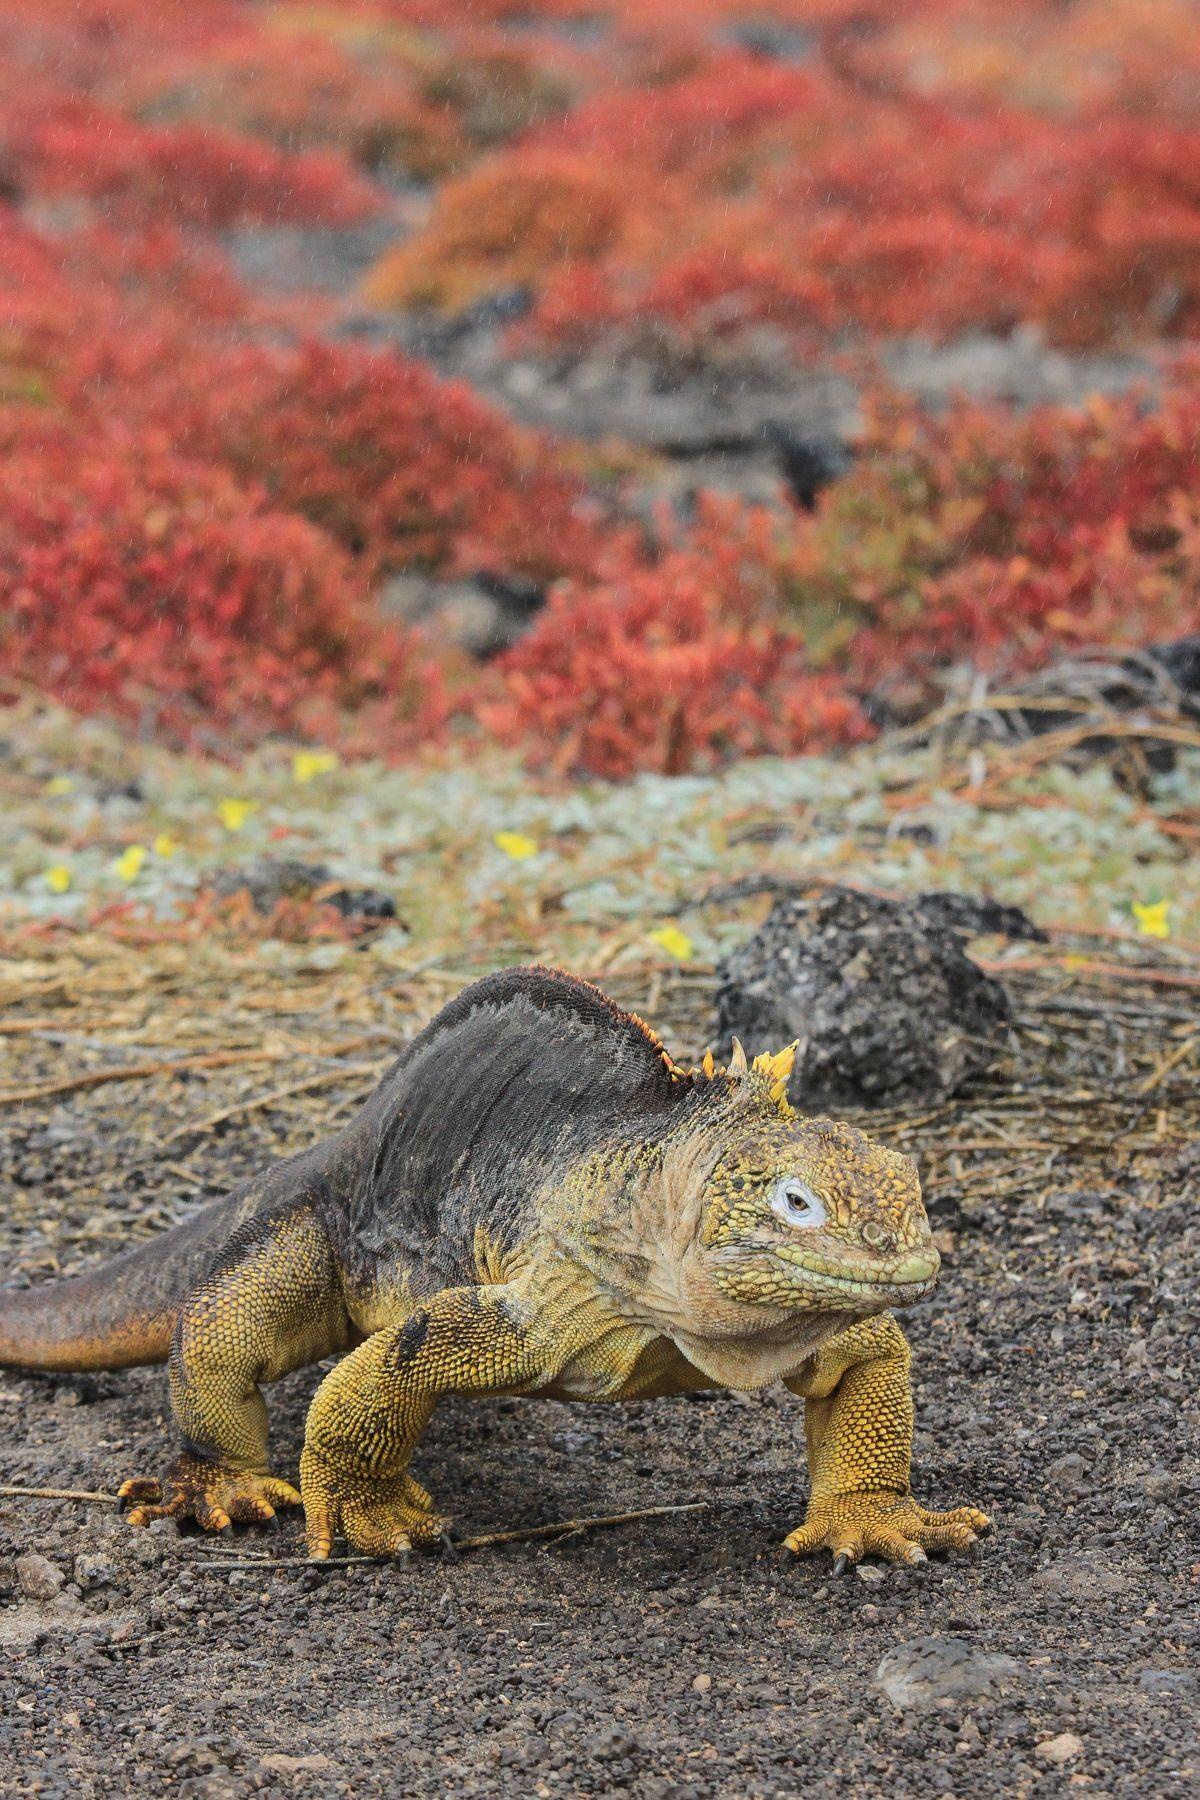 A Land Iguana wanders past some remarkably red vegetation